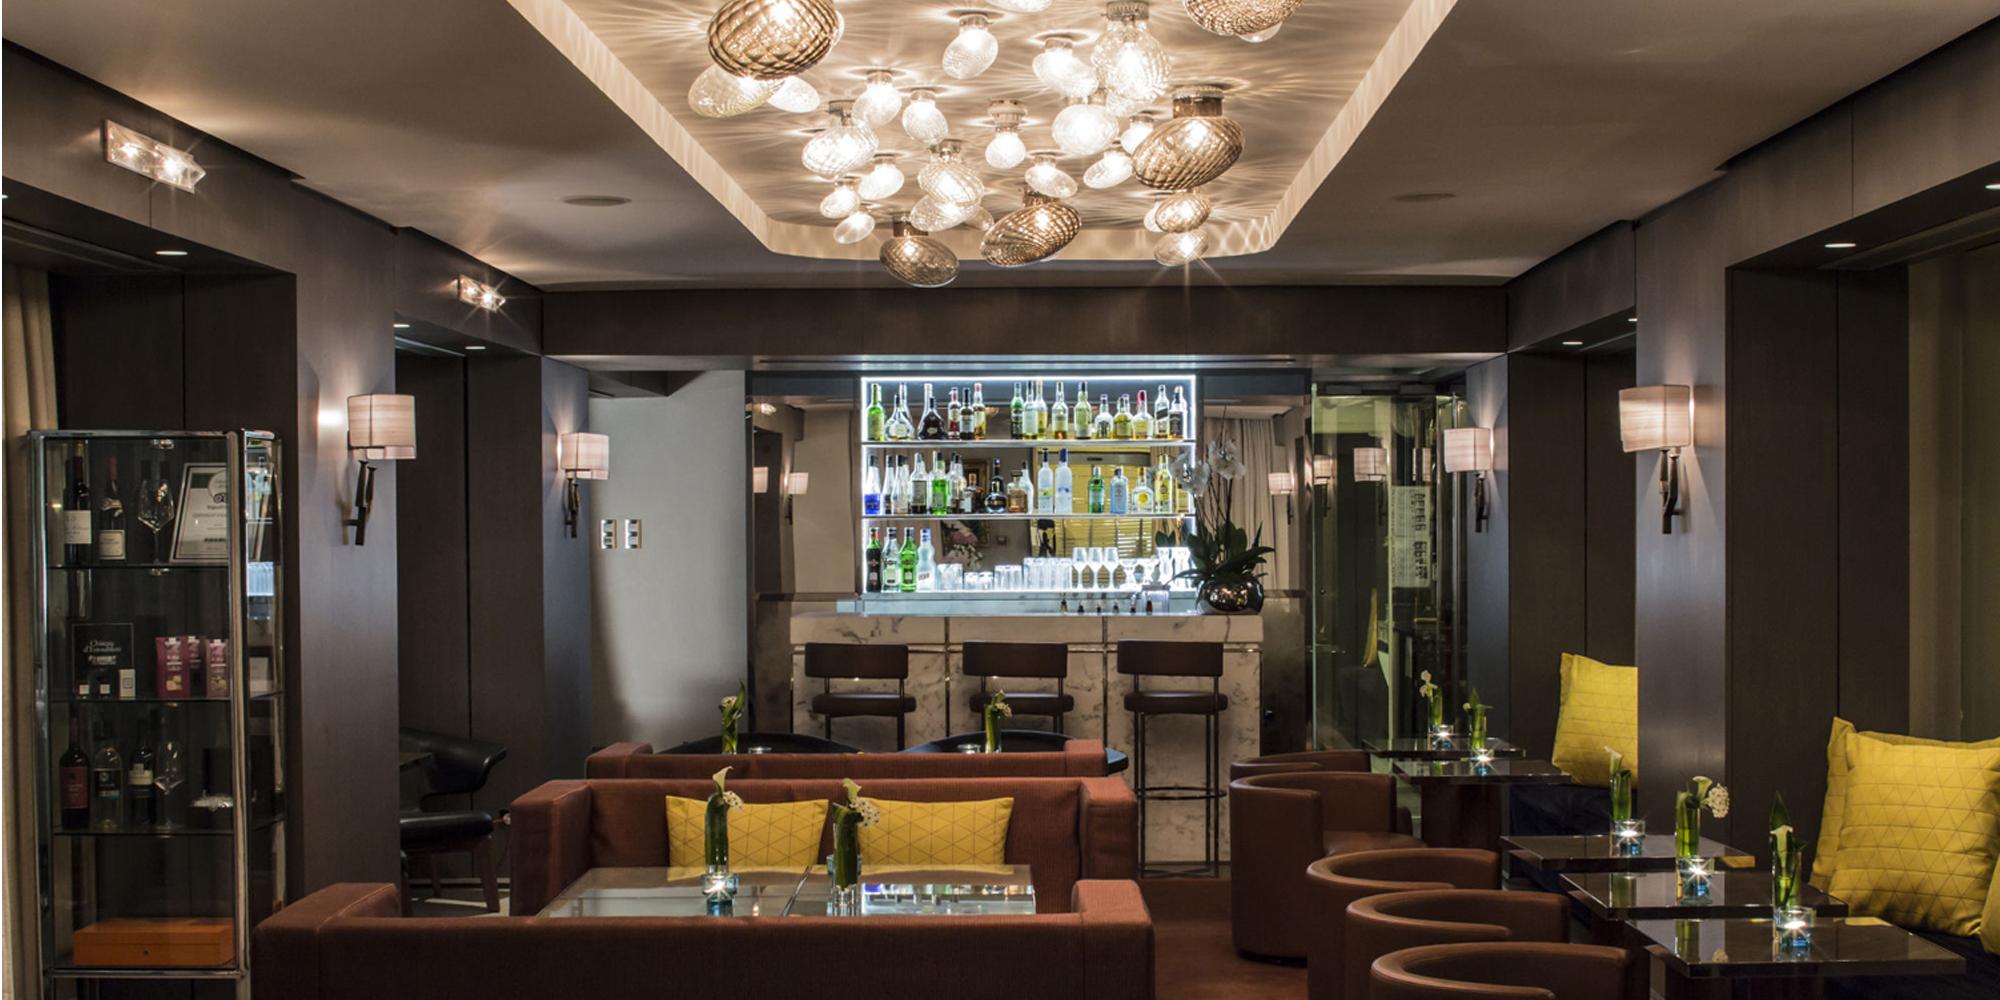 hotel de sers paris 2018 world 39 s best hotels. Black Bedroom Furniture Sets. Home Design Ideas